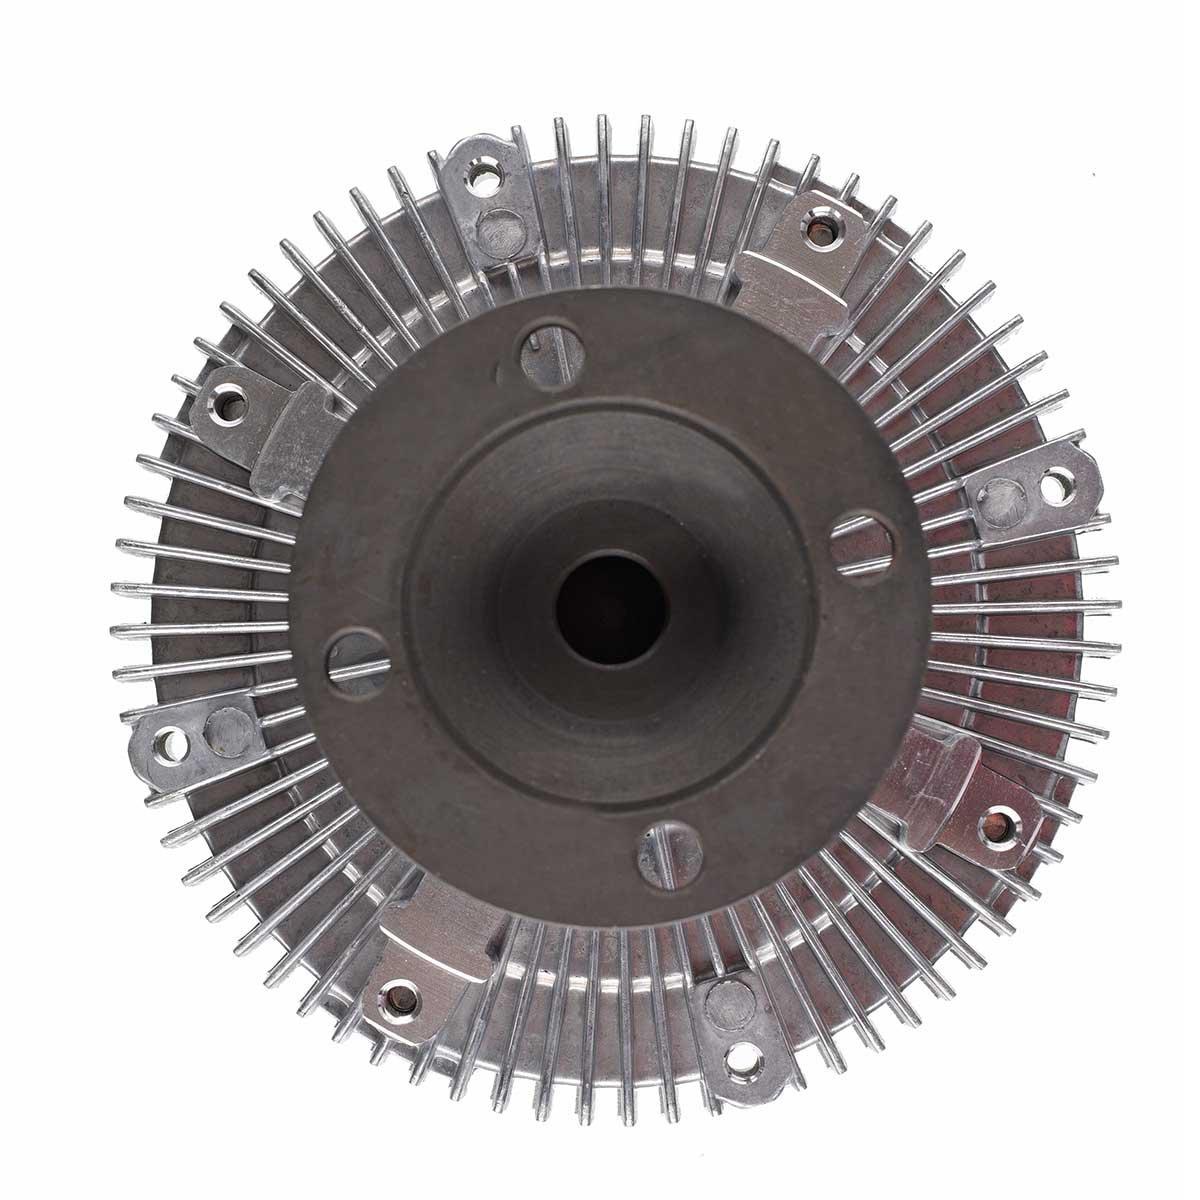 A-Premium Engine Cooling Fan Clutch for Lexus SC300 1992-2000 GS300 1993-1998 Toyota Supra 1993-1998 l6 3.0L